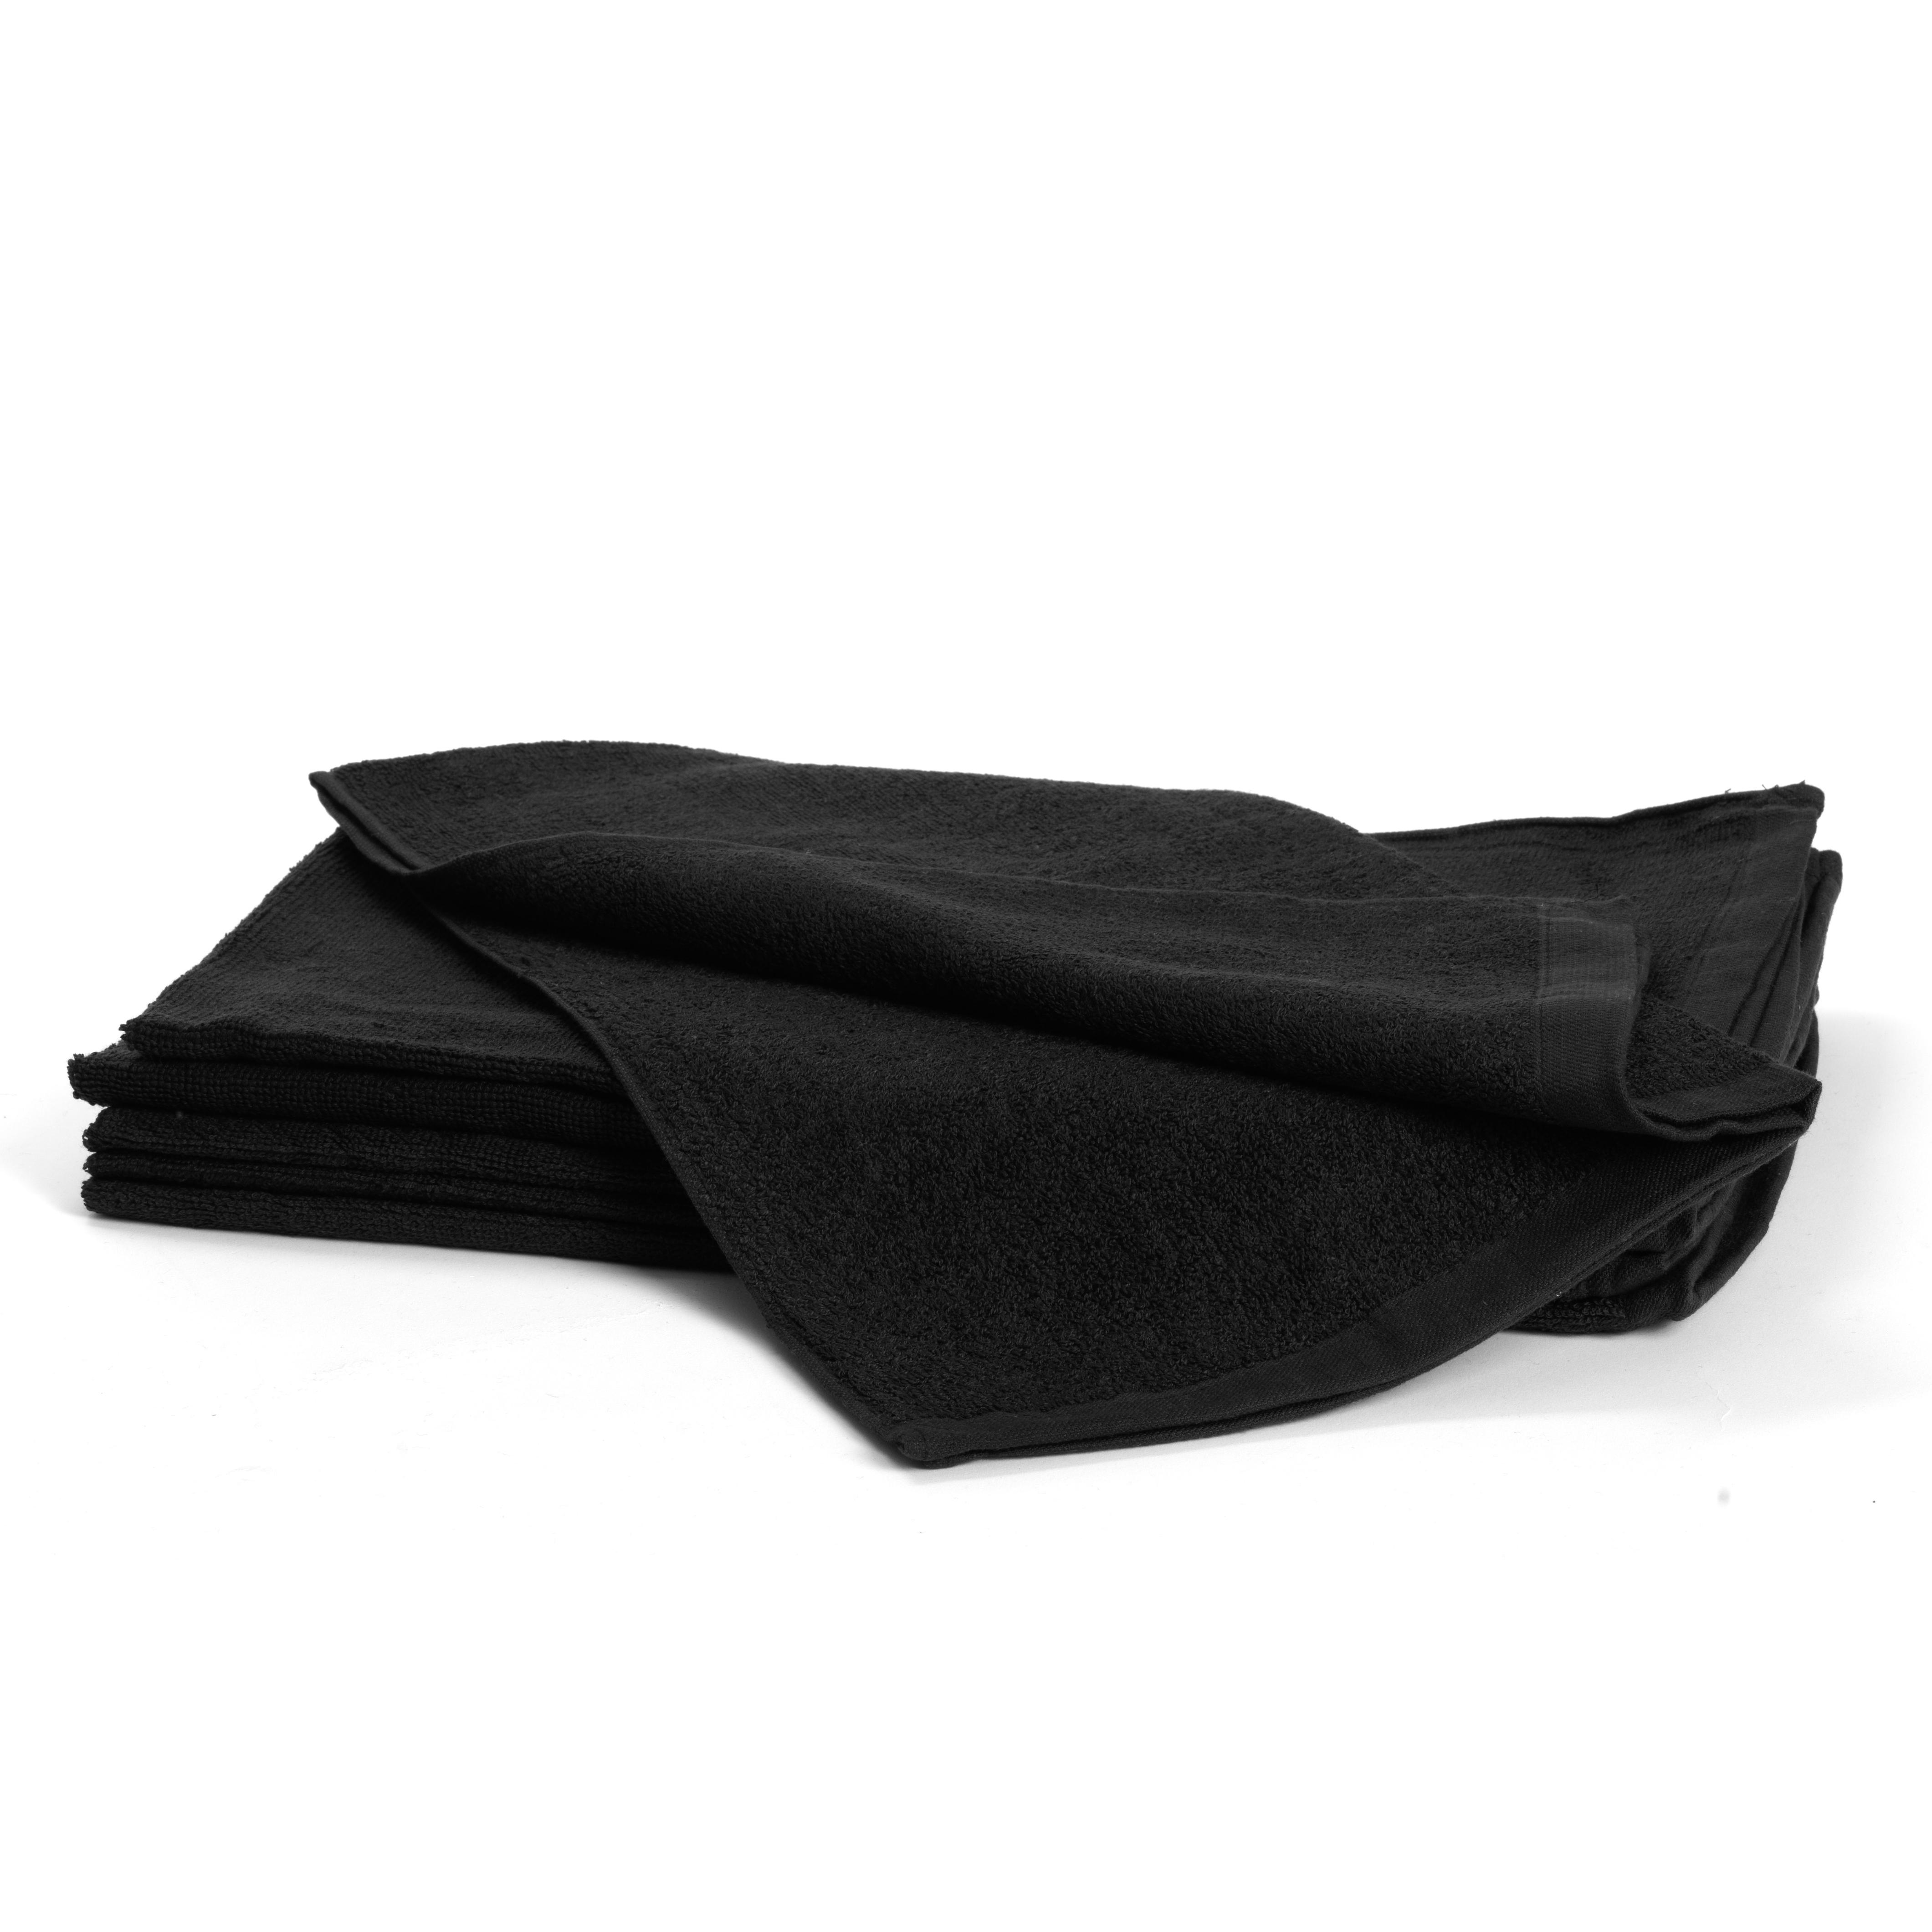 Bleachsafe Towels black 5080 - froté uterák čierny, 50 x 85 cm